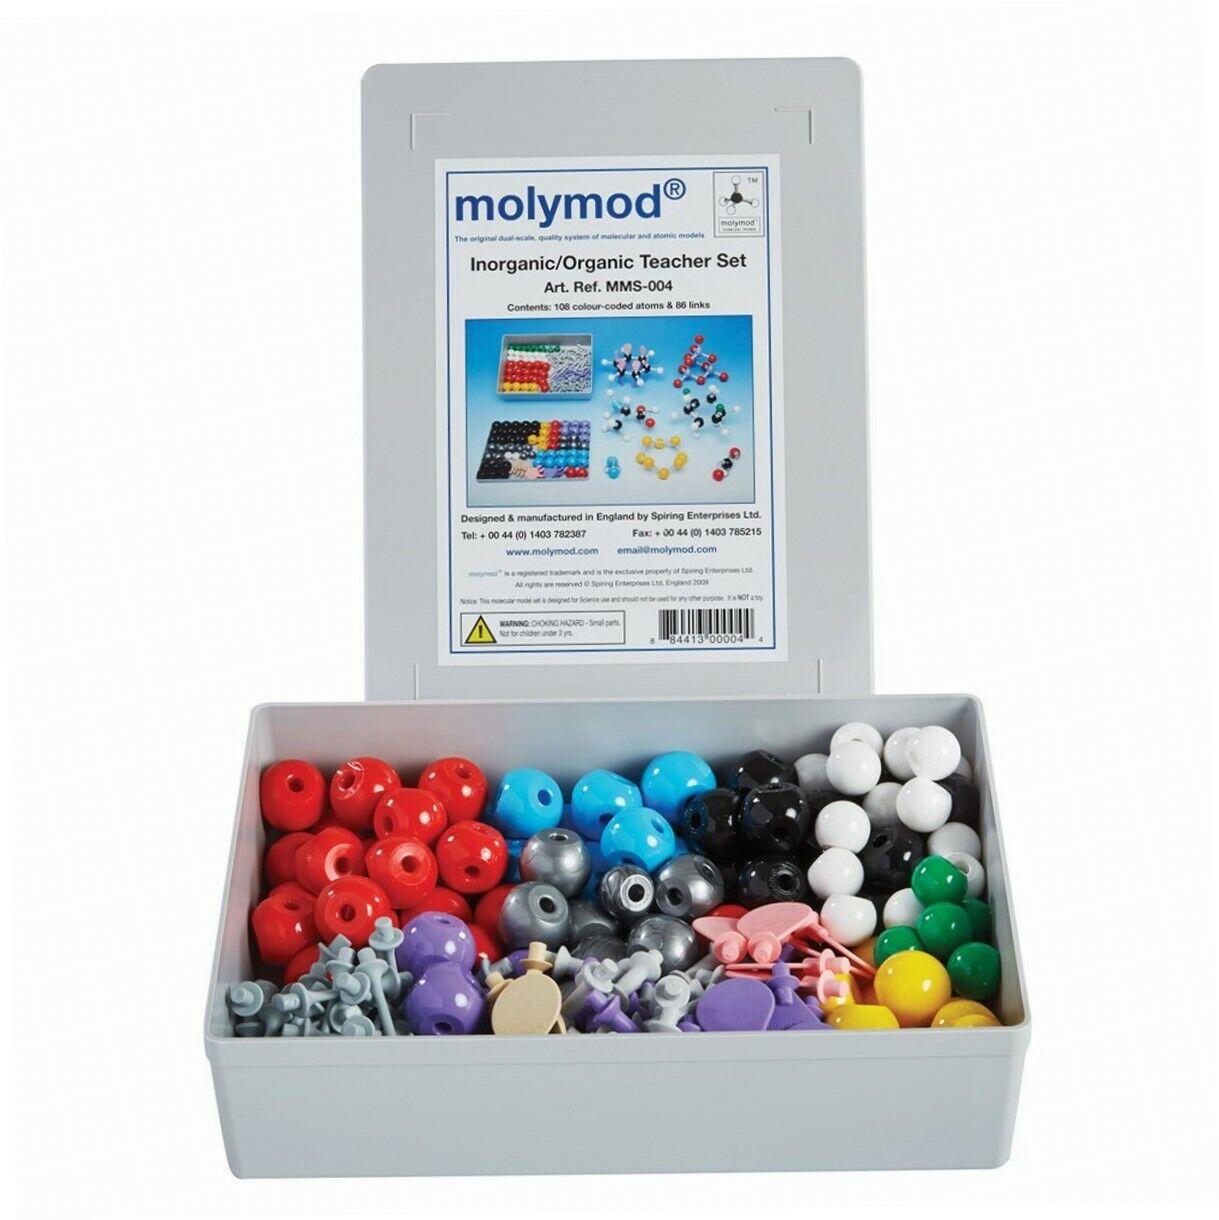 Molymod MMS-004Anorganisches Organisches Chemie-Molekular-Modell, Lehrer-Set...